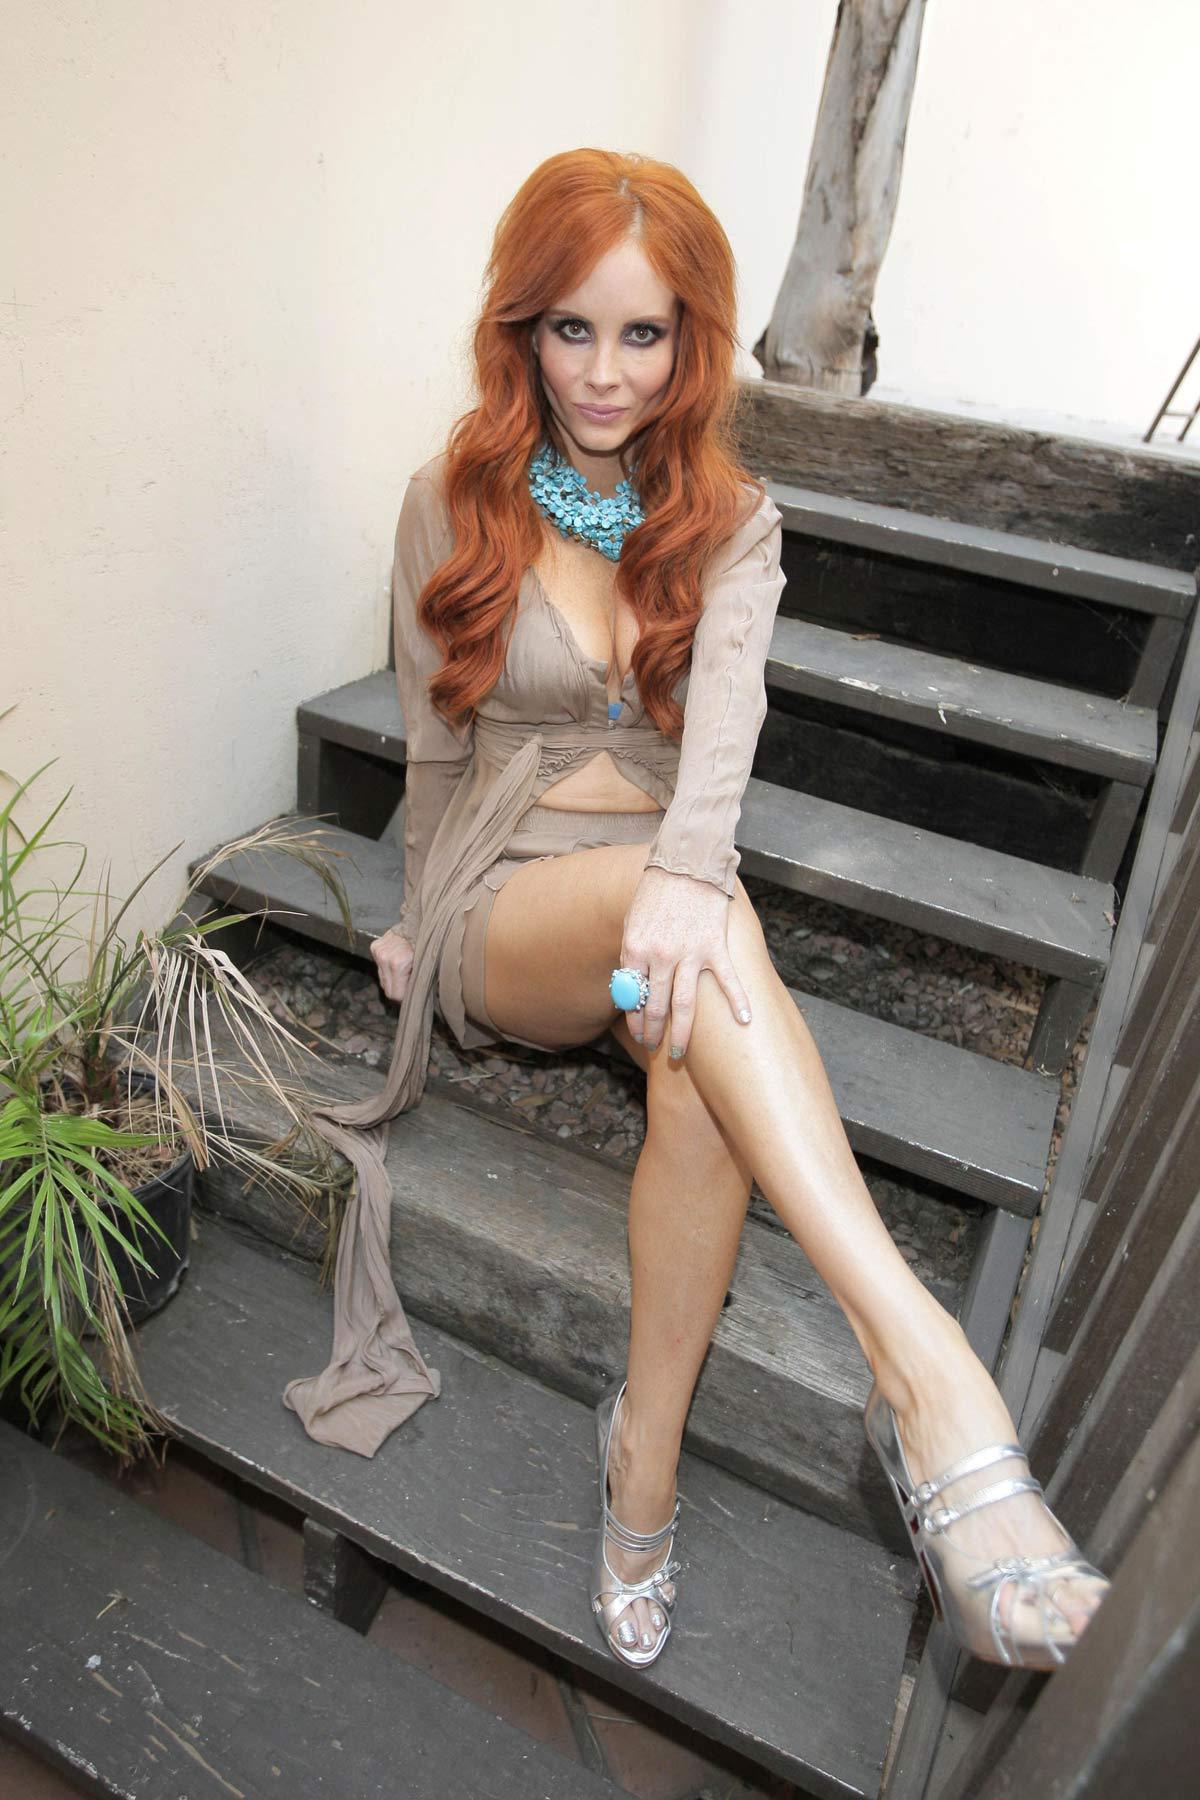 Nackt Natalya rudakova nackter körper aktbilder daumen